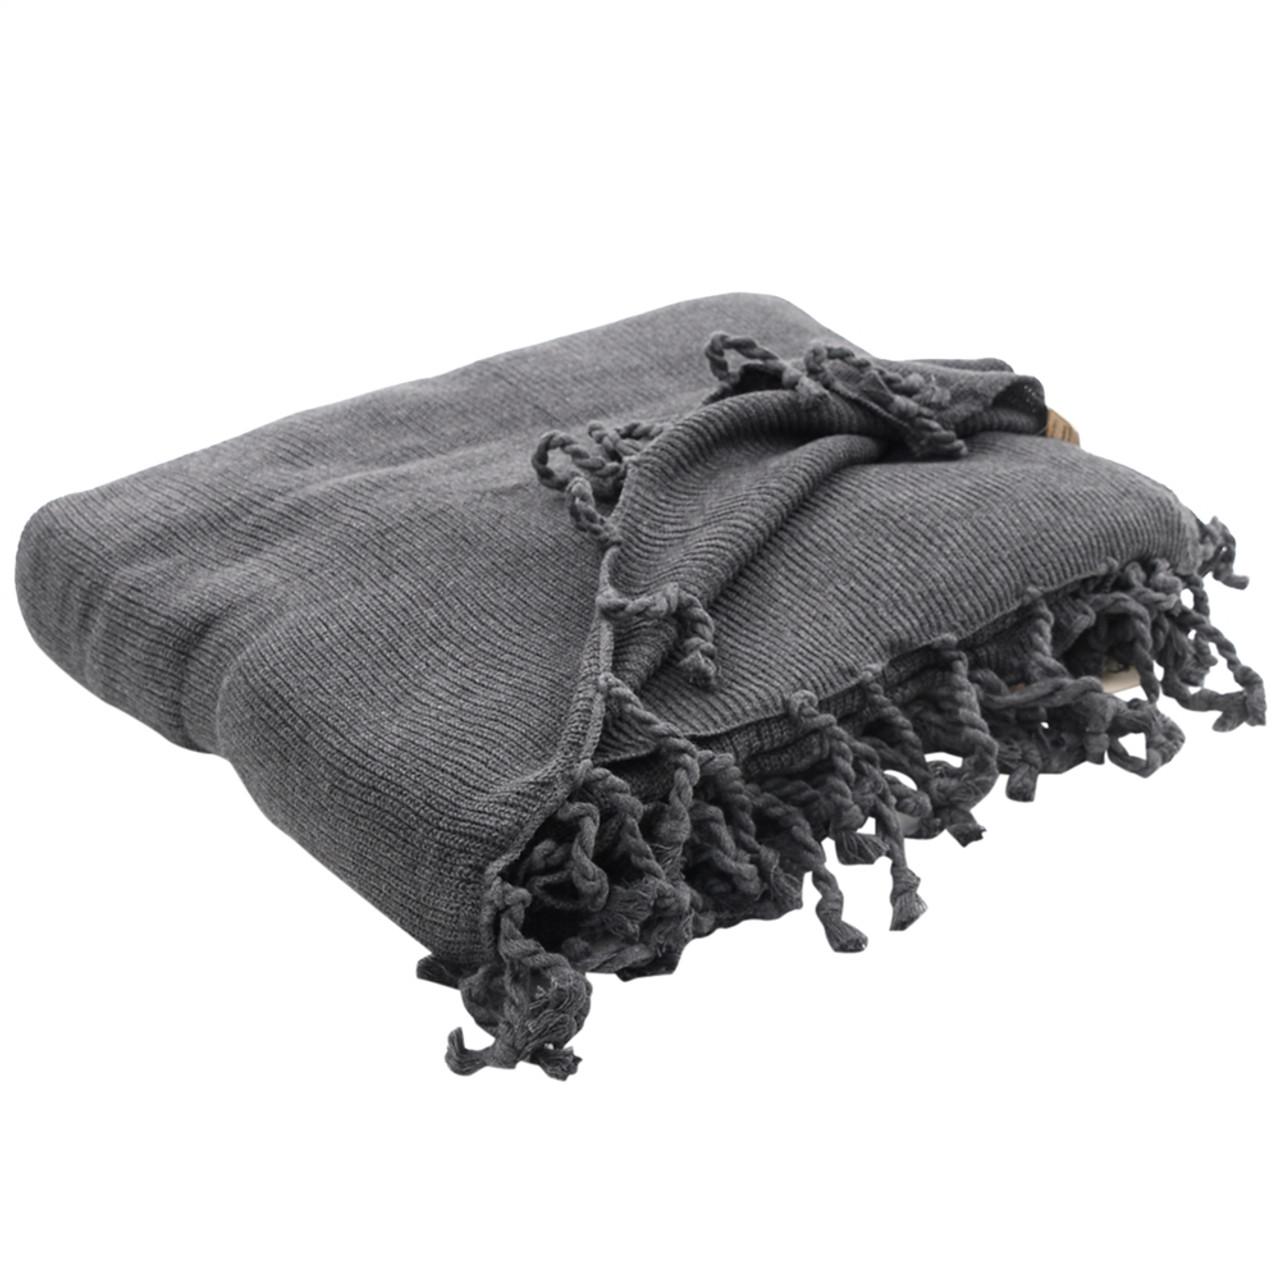 Organic Throw Blanket - Grey